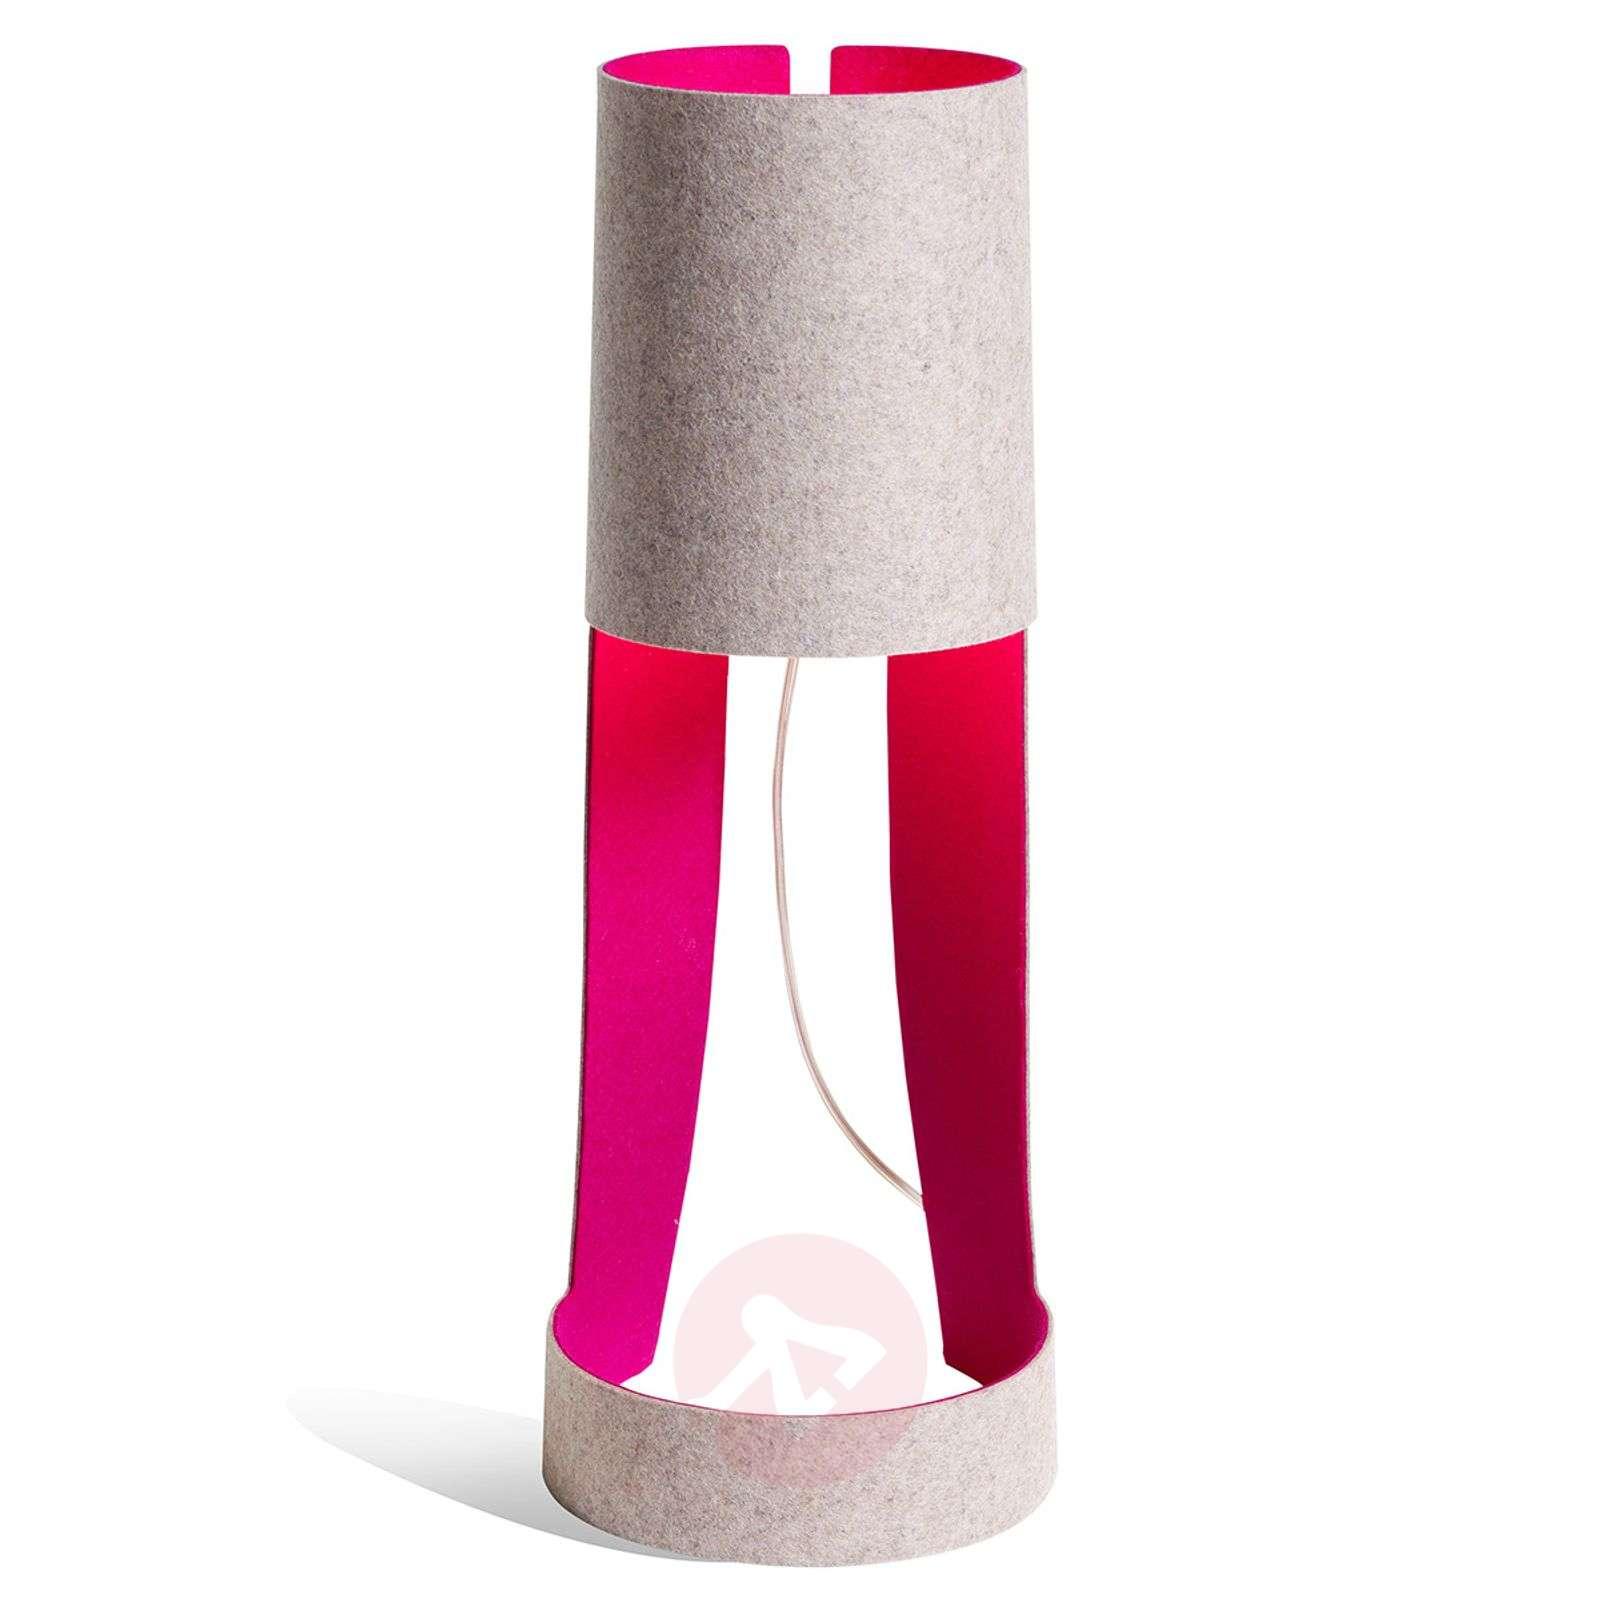 Cheerful table lamp Mia-2600453X-01